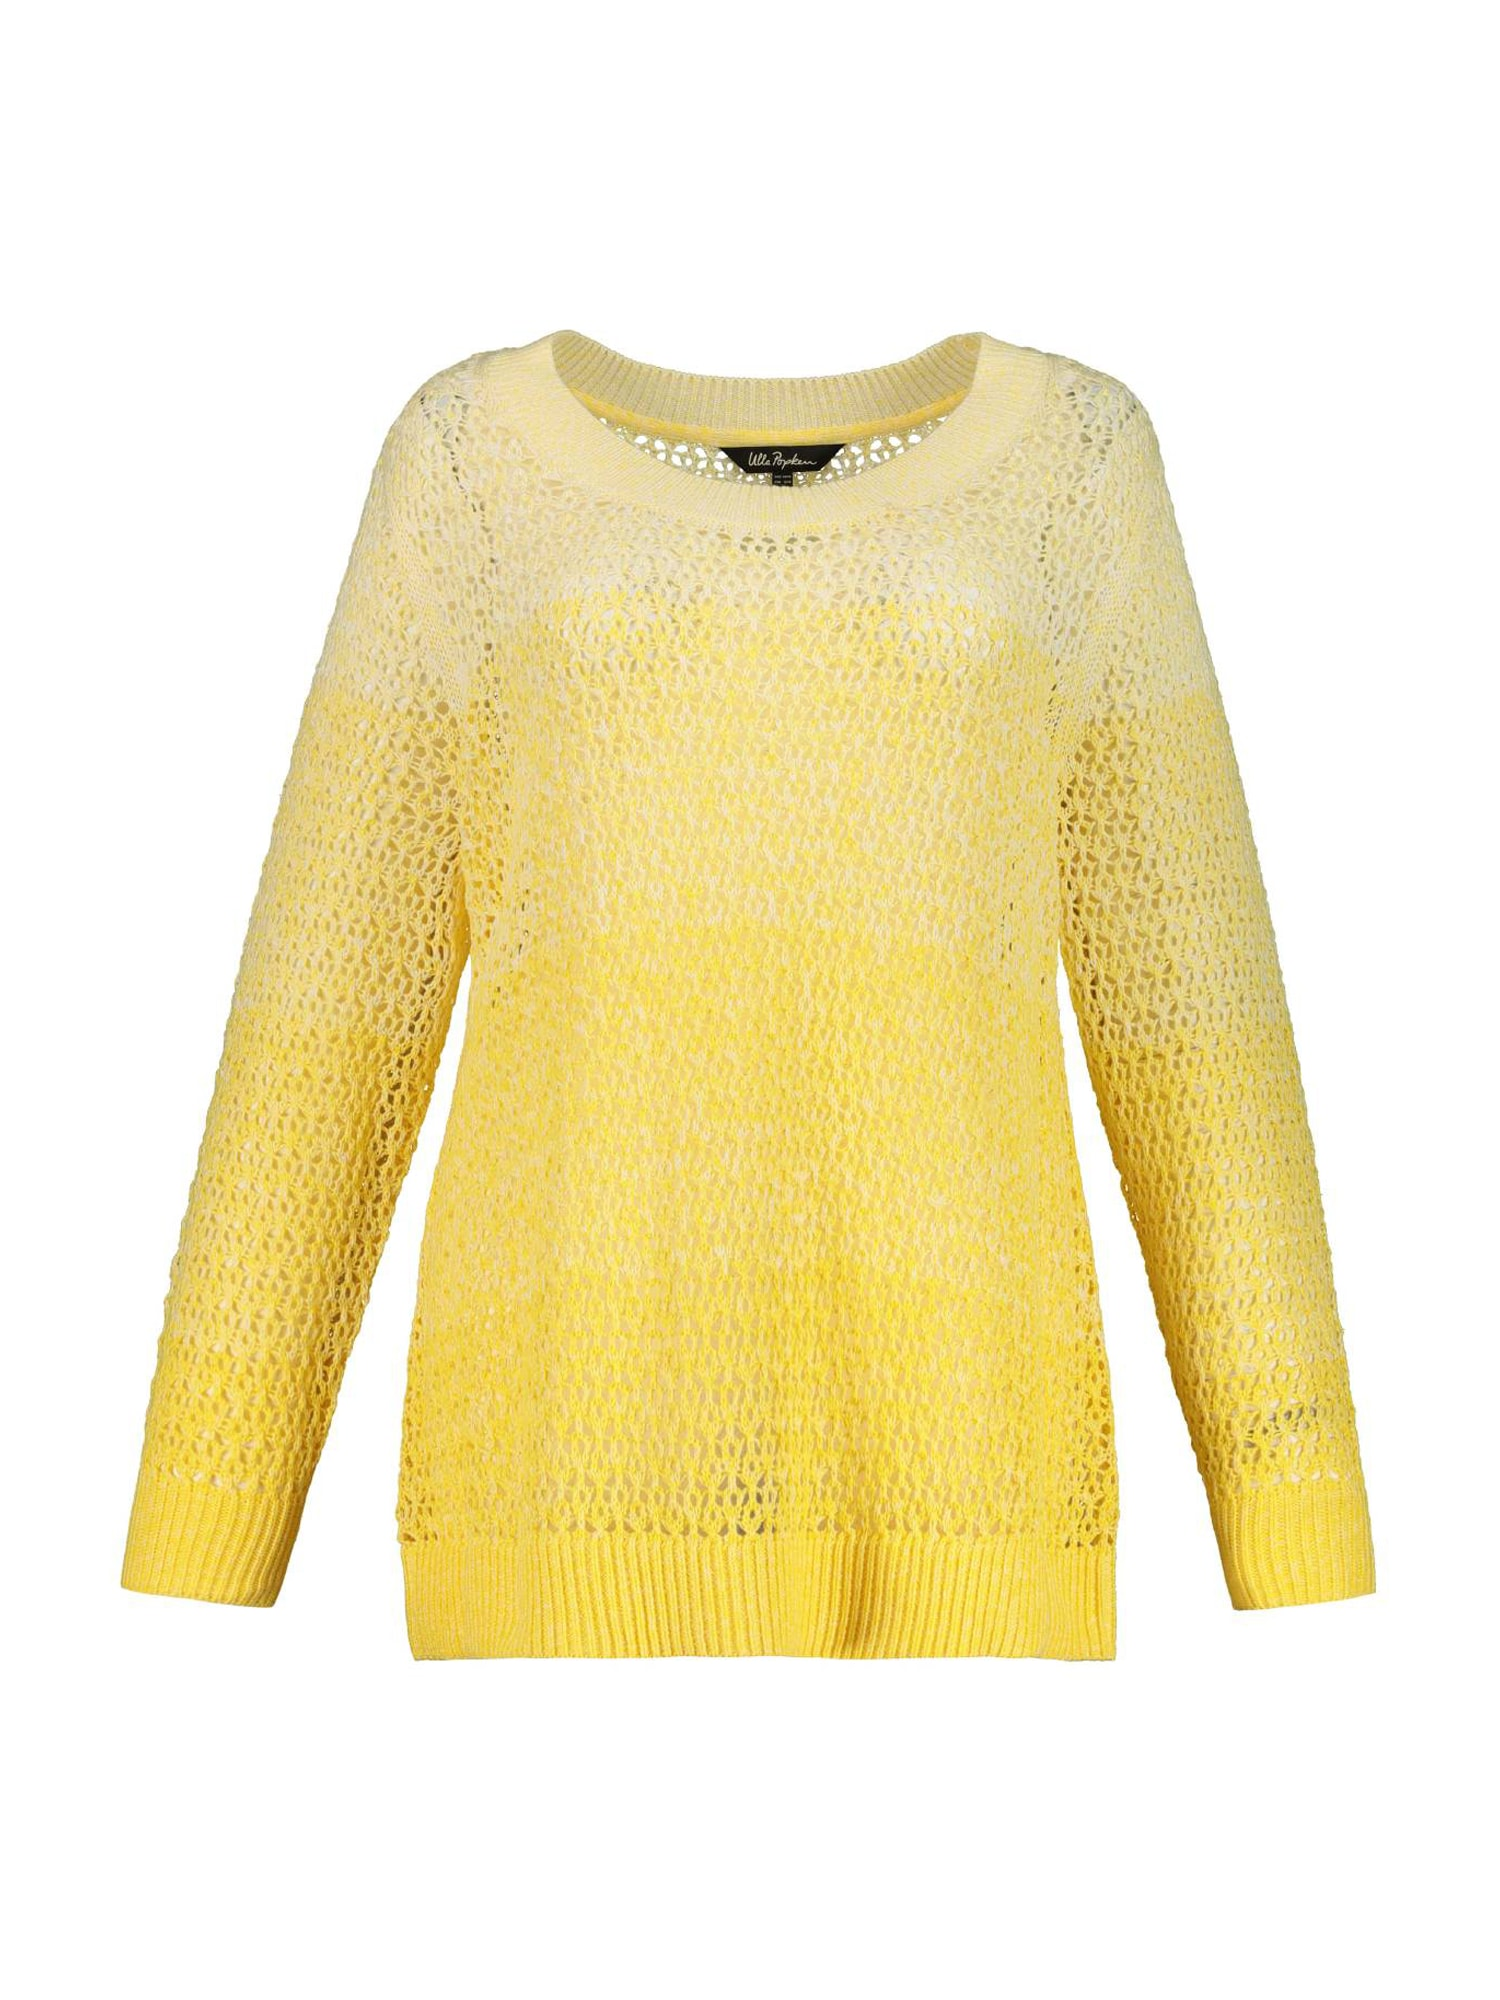 Ulla Popken Megztinis geltona / šviesiai geltona